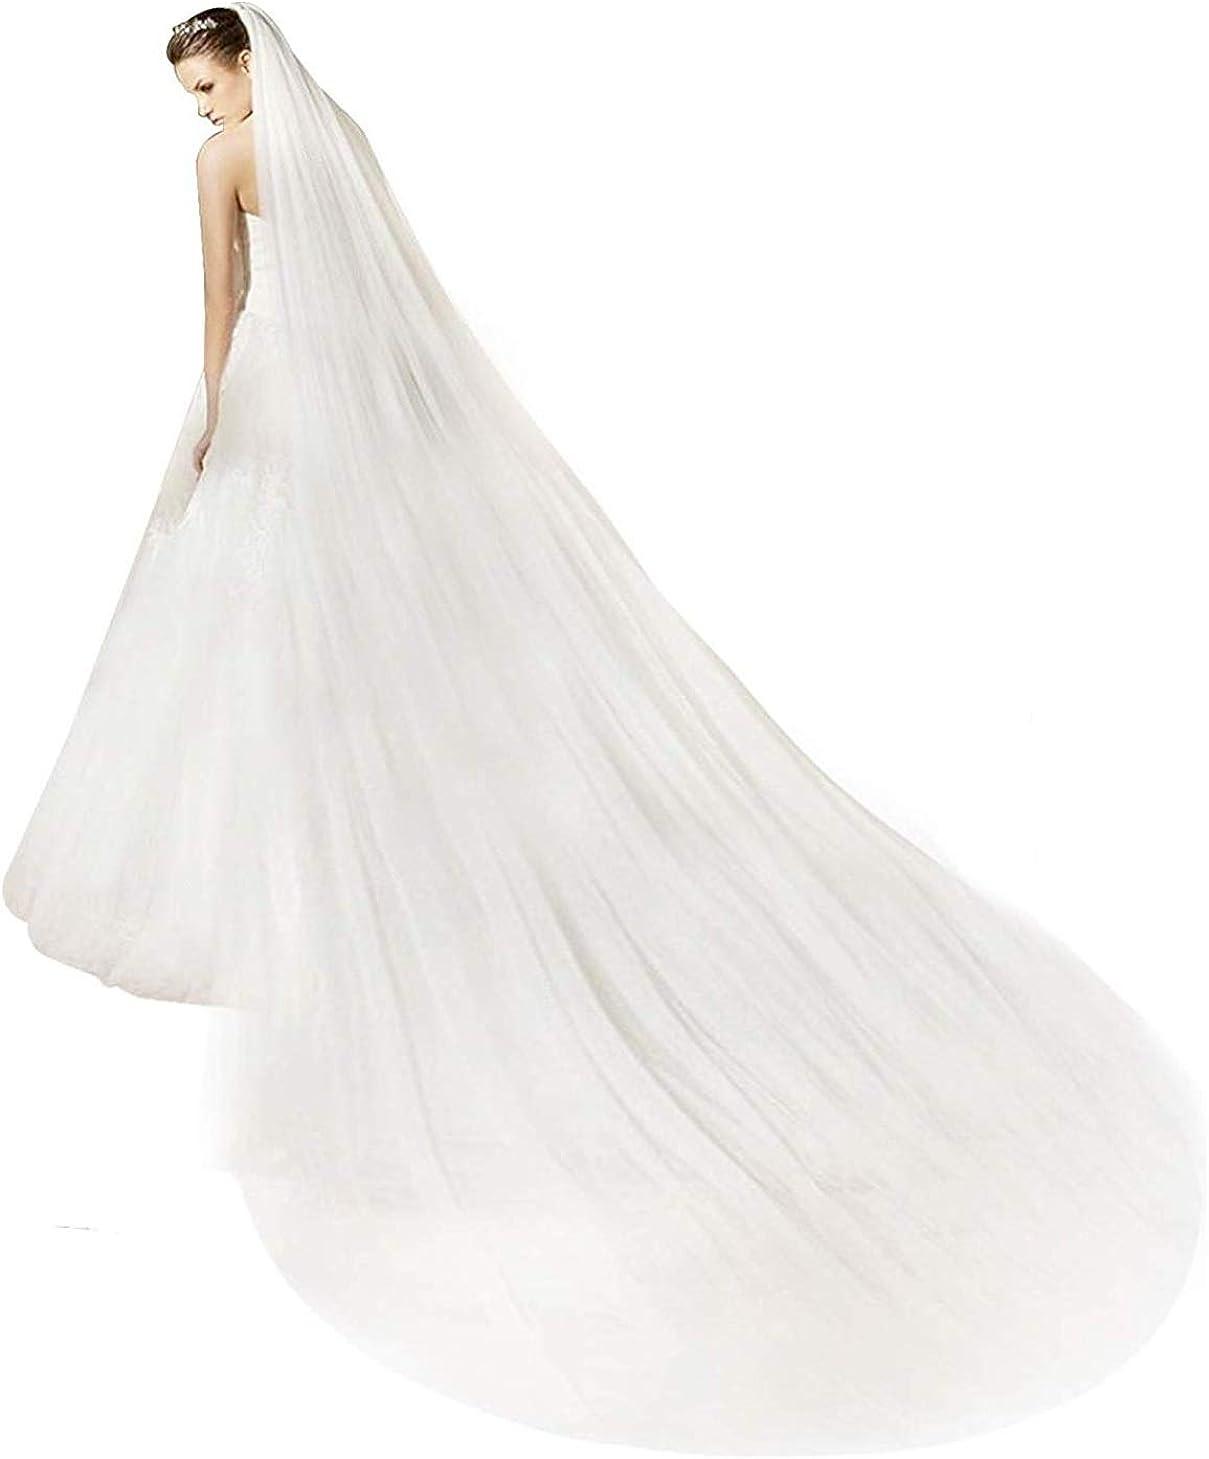 Shop Ginger Wedding Handmade USA Cathedral Royal Double Layer 2T Bridal Veil Cut Edge